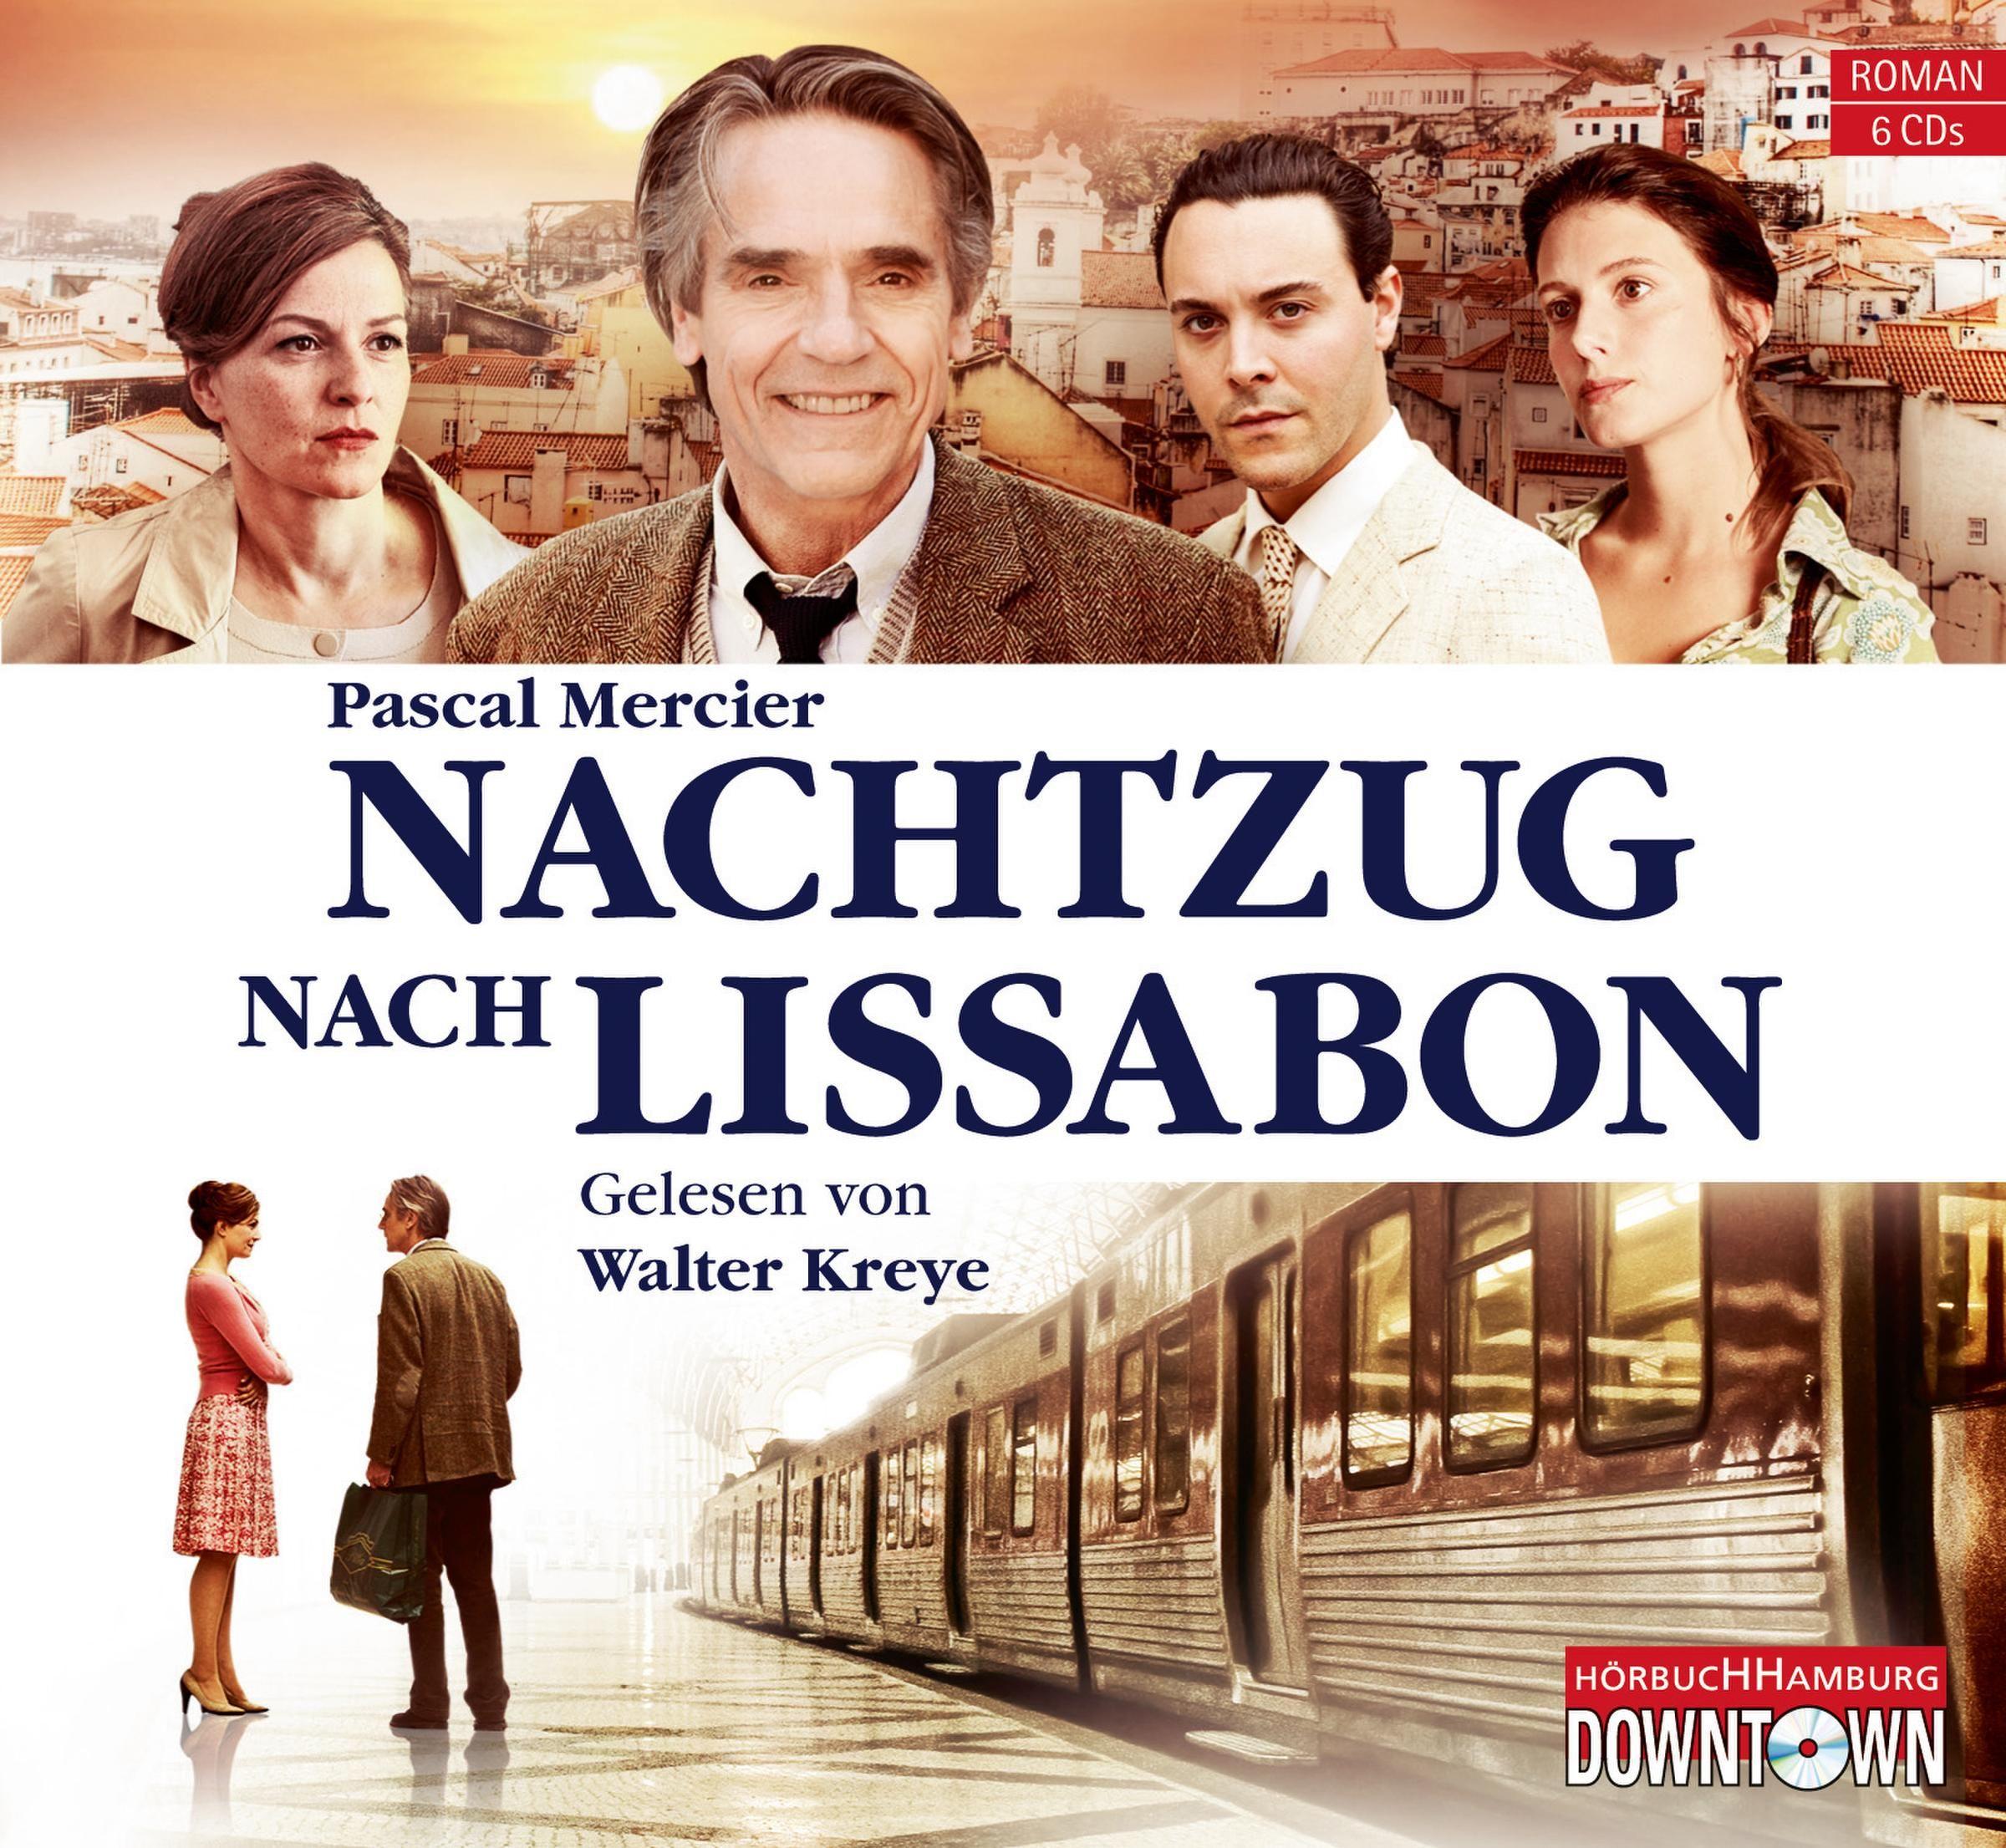 Nachtzug nach Lissabon (Filmausgabe) Pascal Mercier